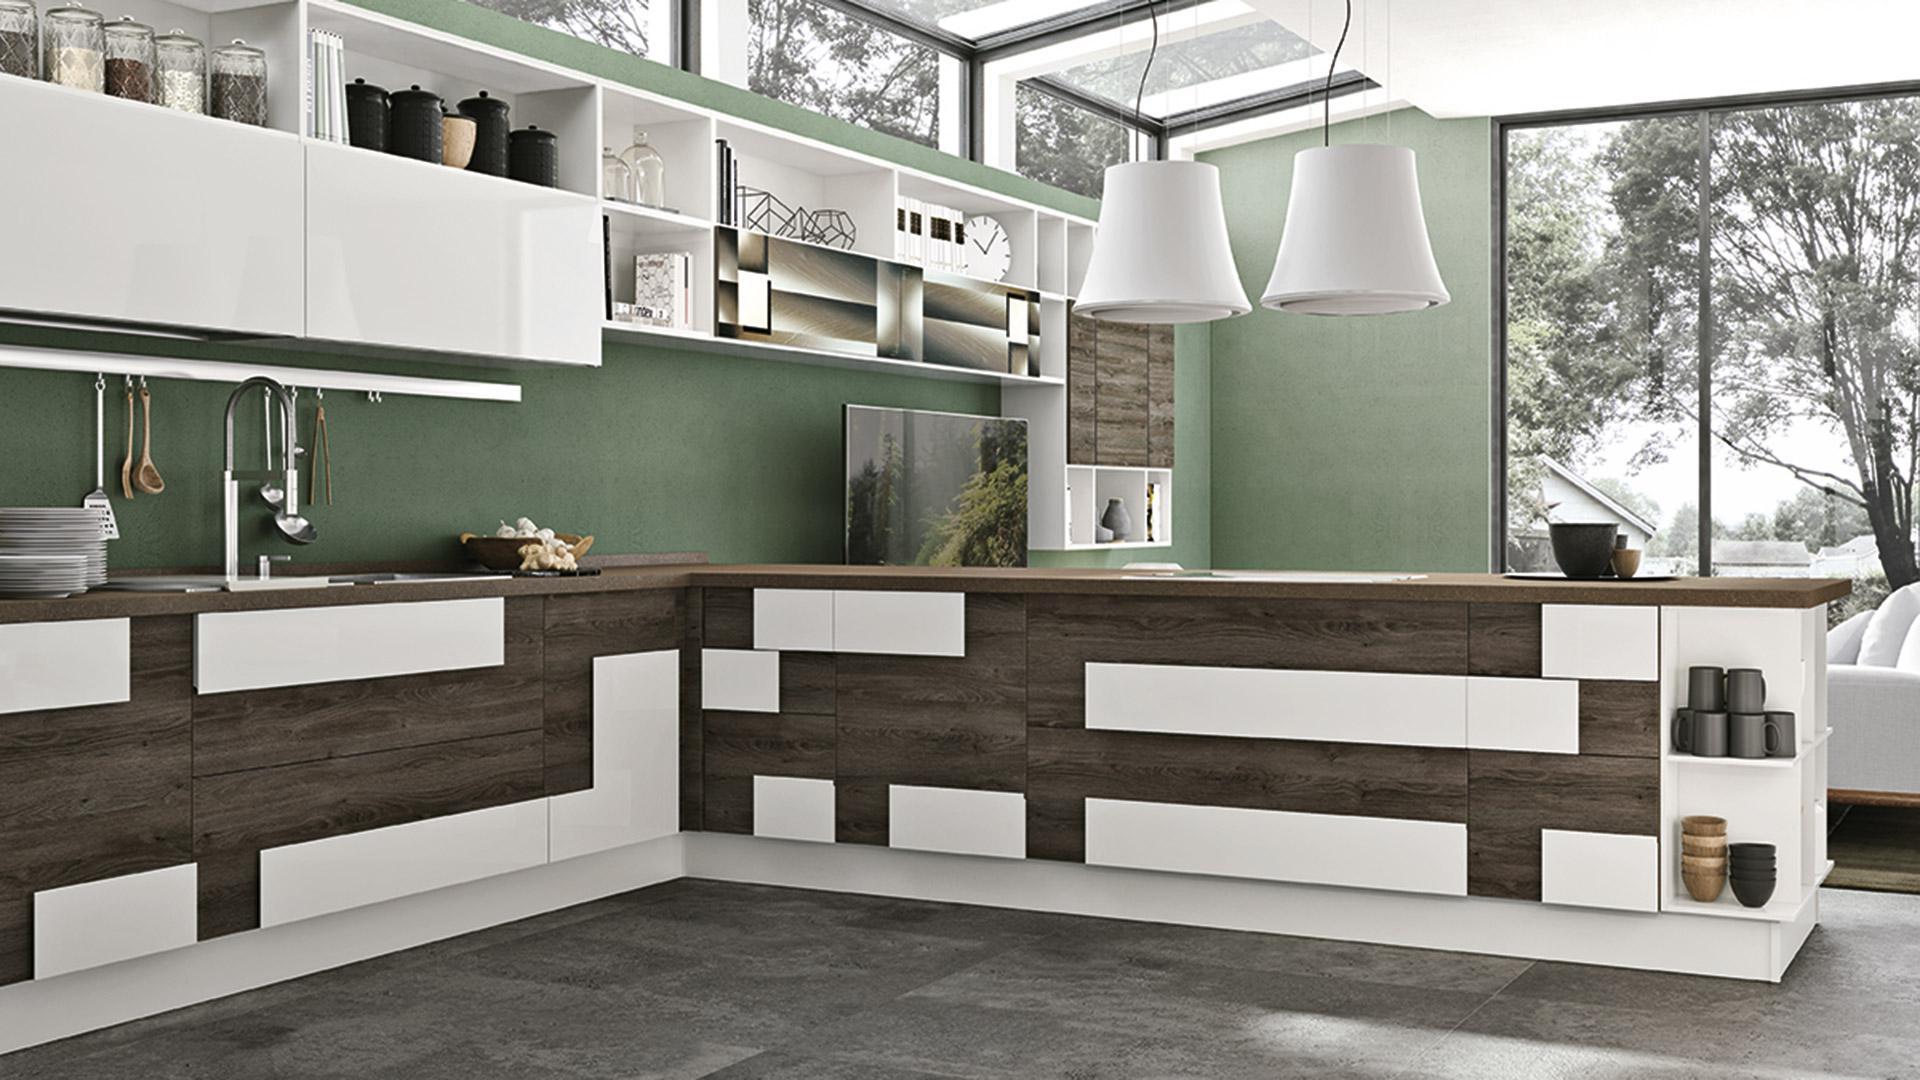 Cucina Creativa - LUBE Store Avigliana